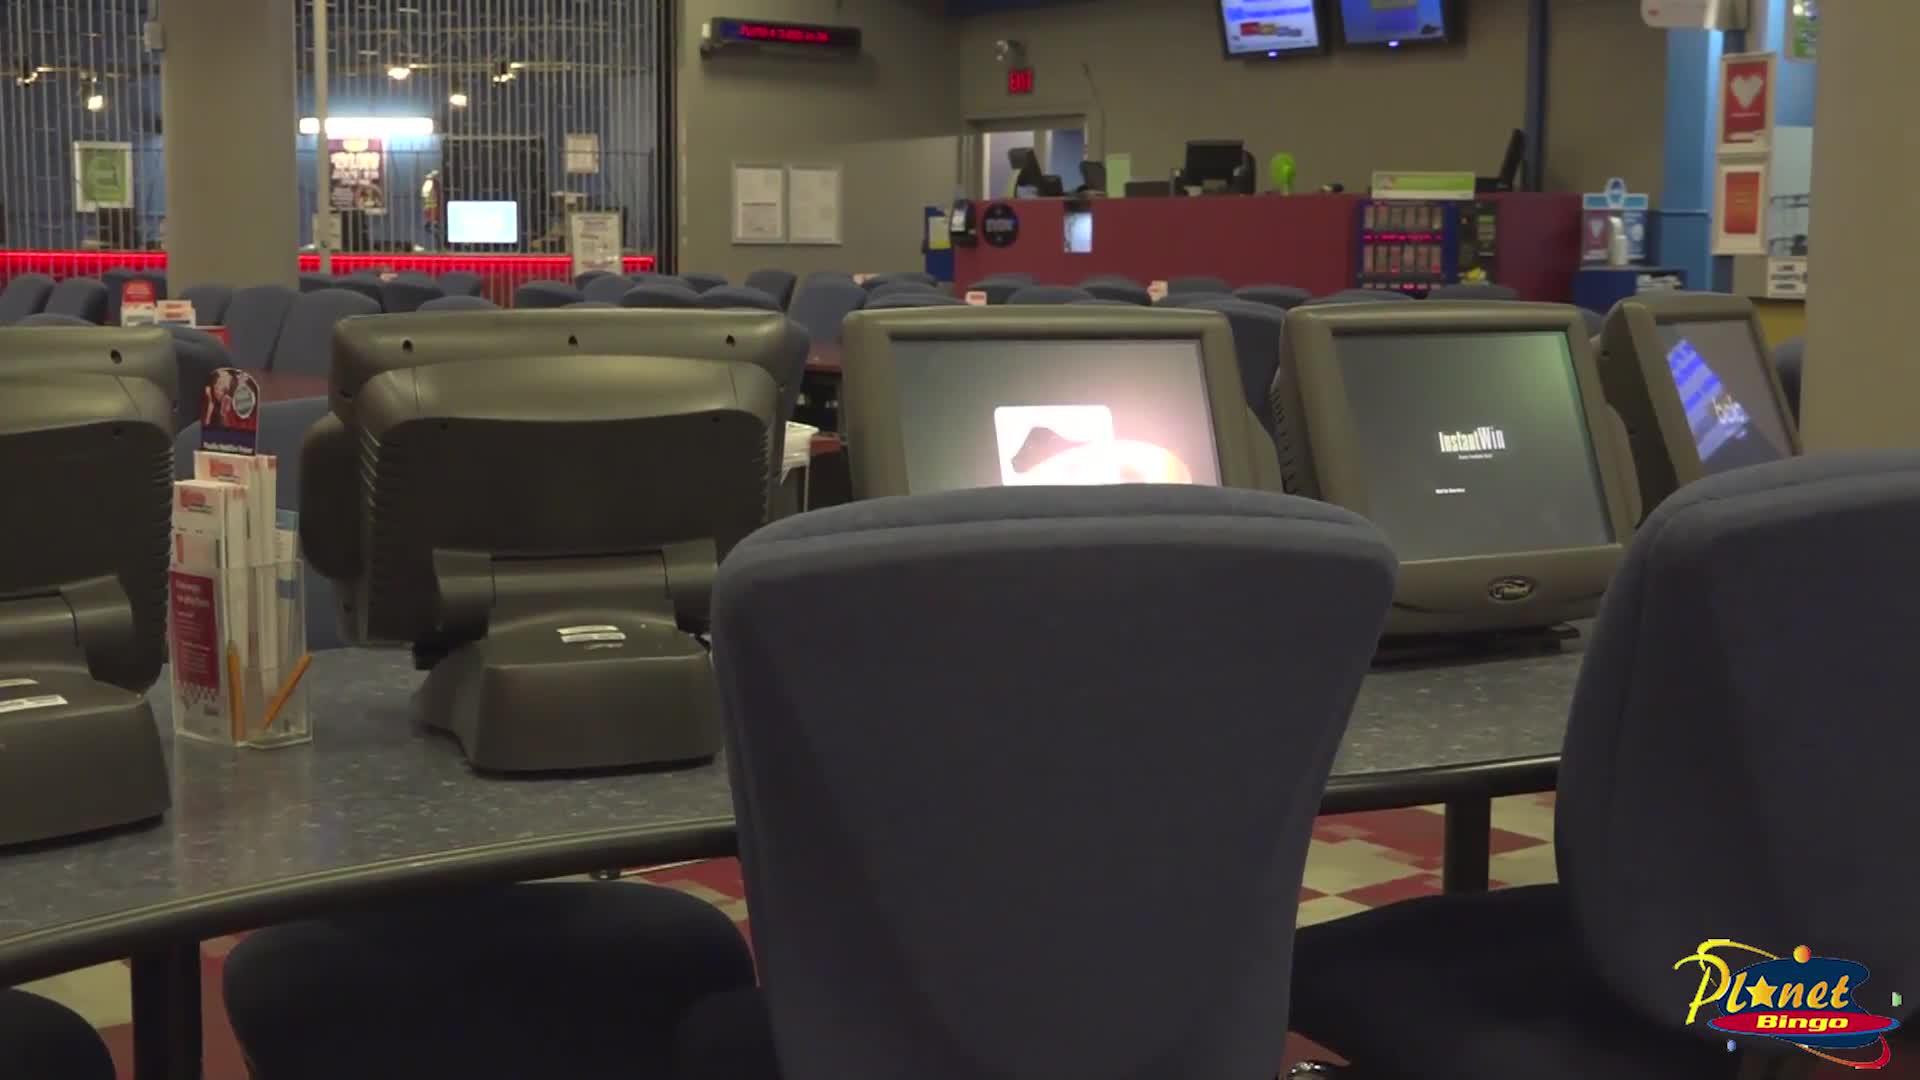 Planet Bingo - Casinos - 604-879-8930